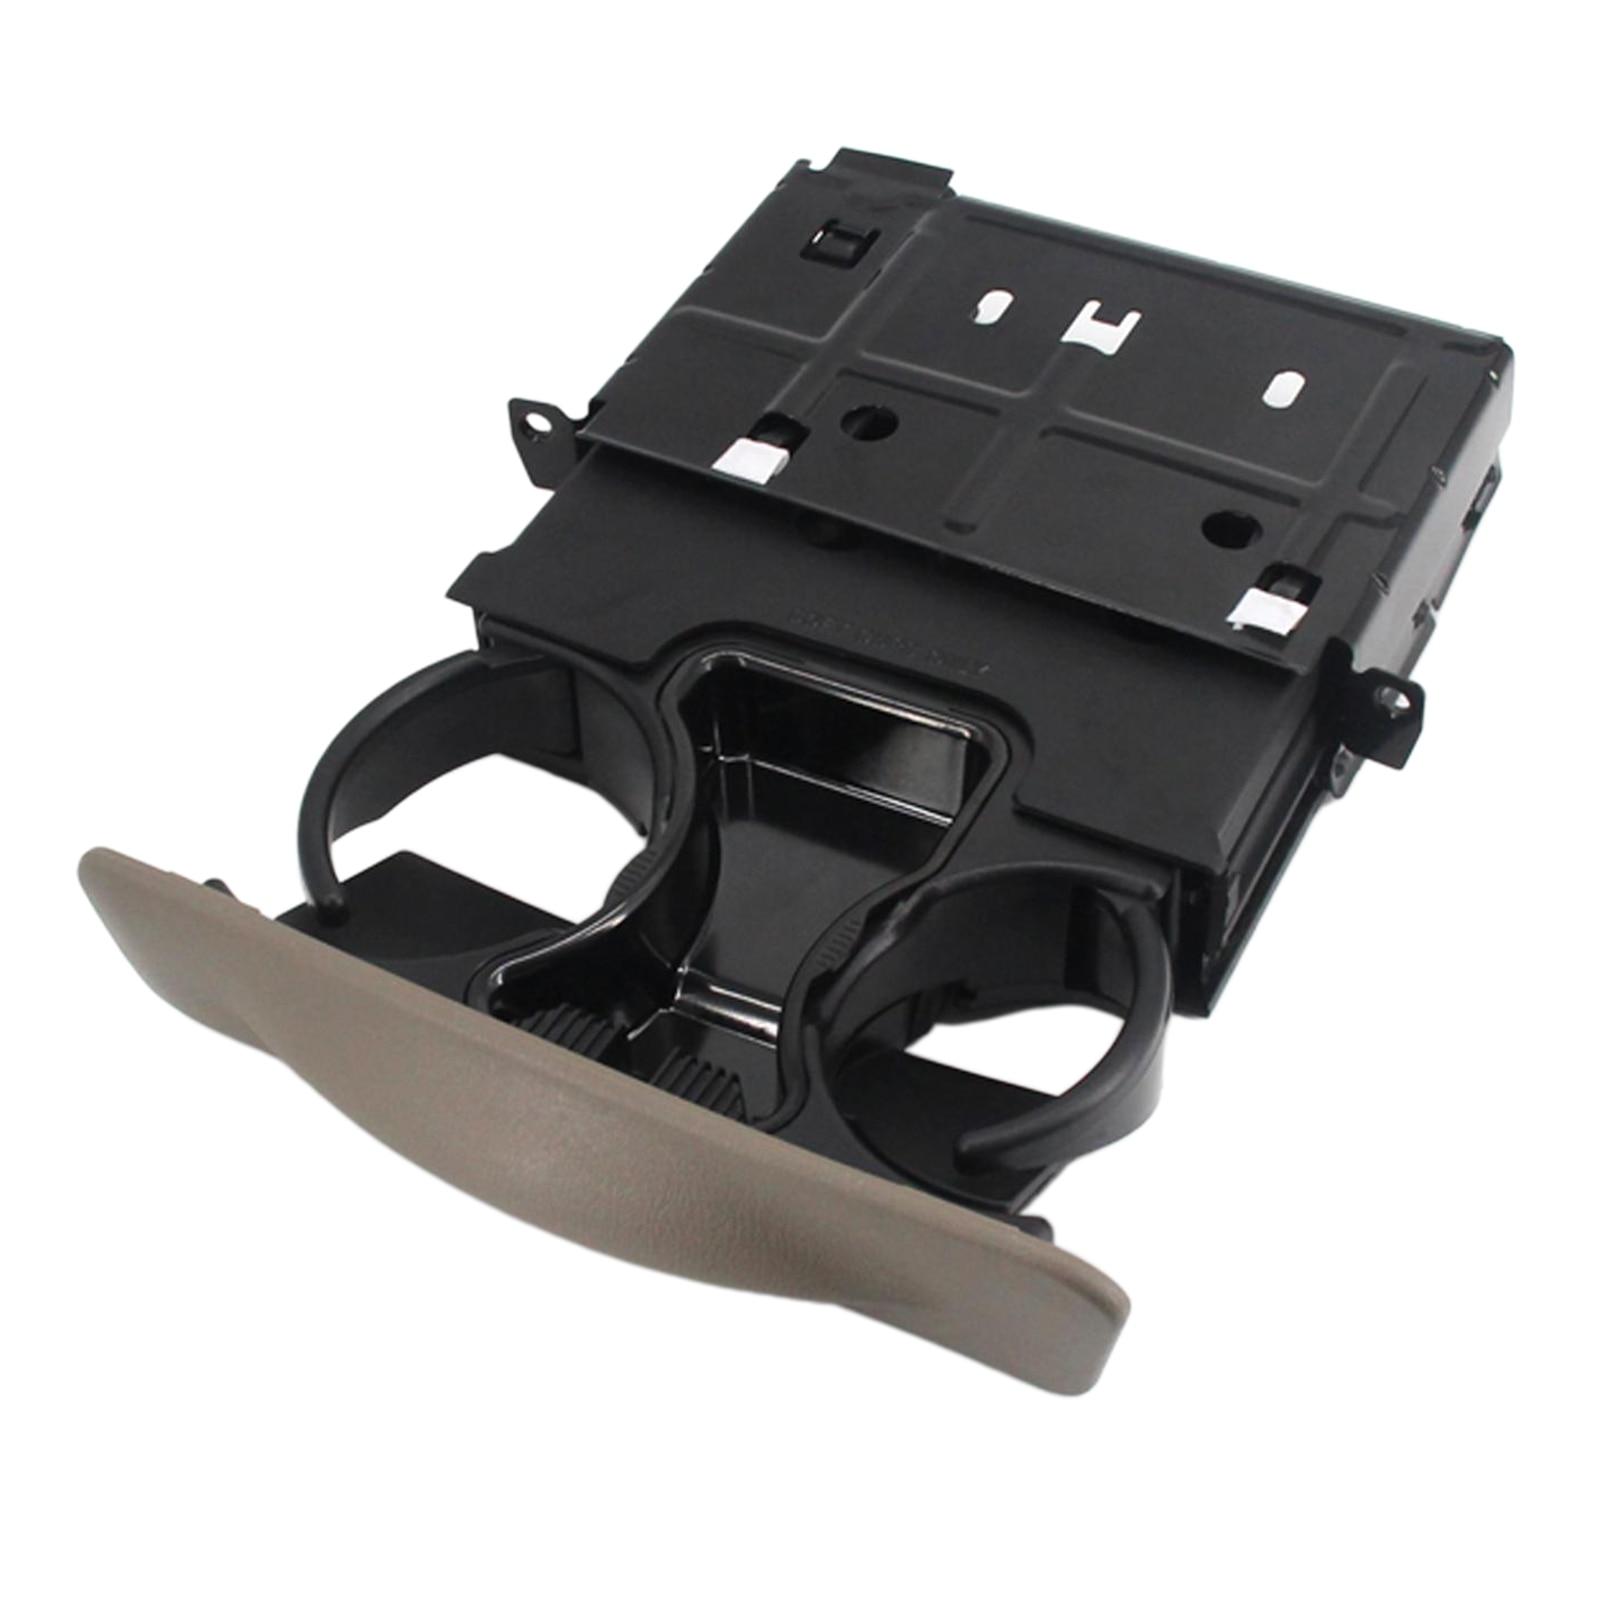 Dashboard Cup Holder YC3Z-2513560-CAD for Ford F-350 F450 F-450 F550 F-550